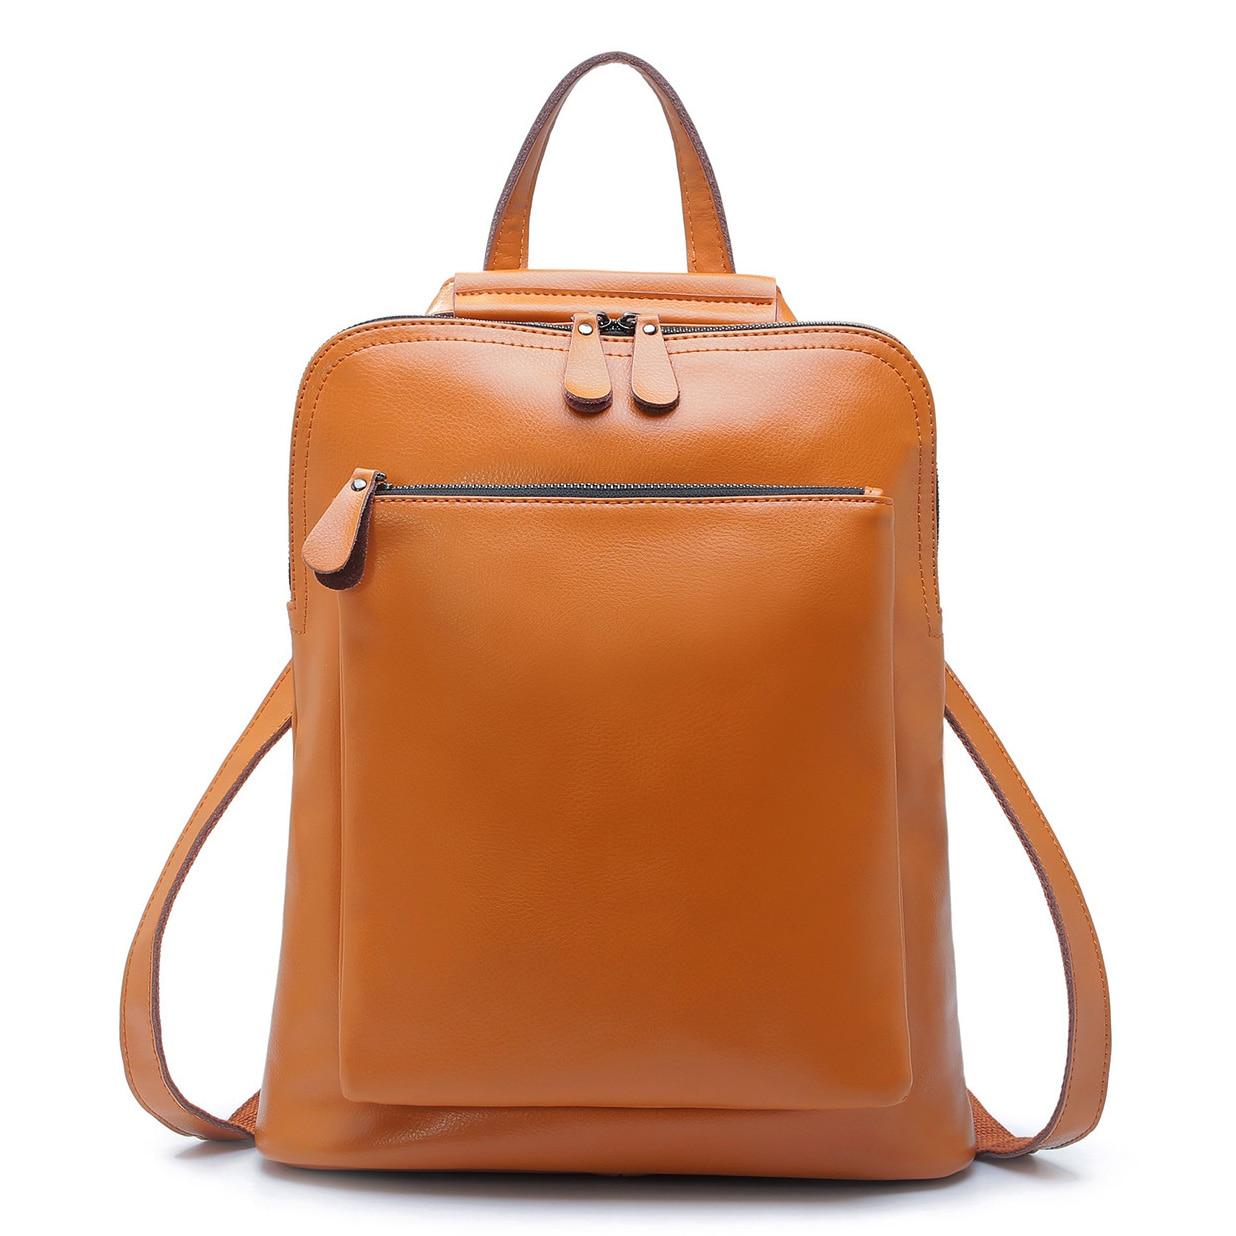 Amazing Claire Chase Milano Ladies Leather Computer Tote Bag Womens Laptop Handbag | EBay